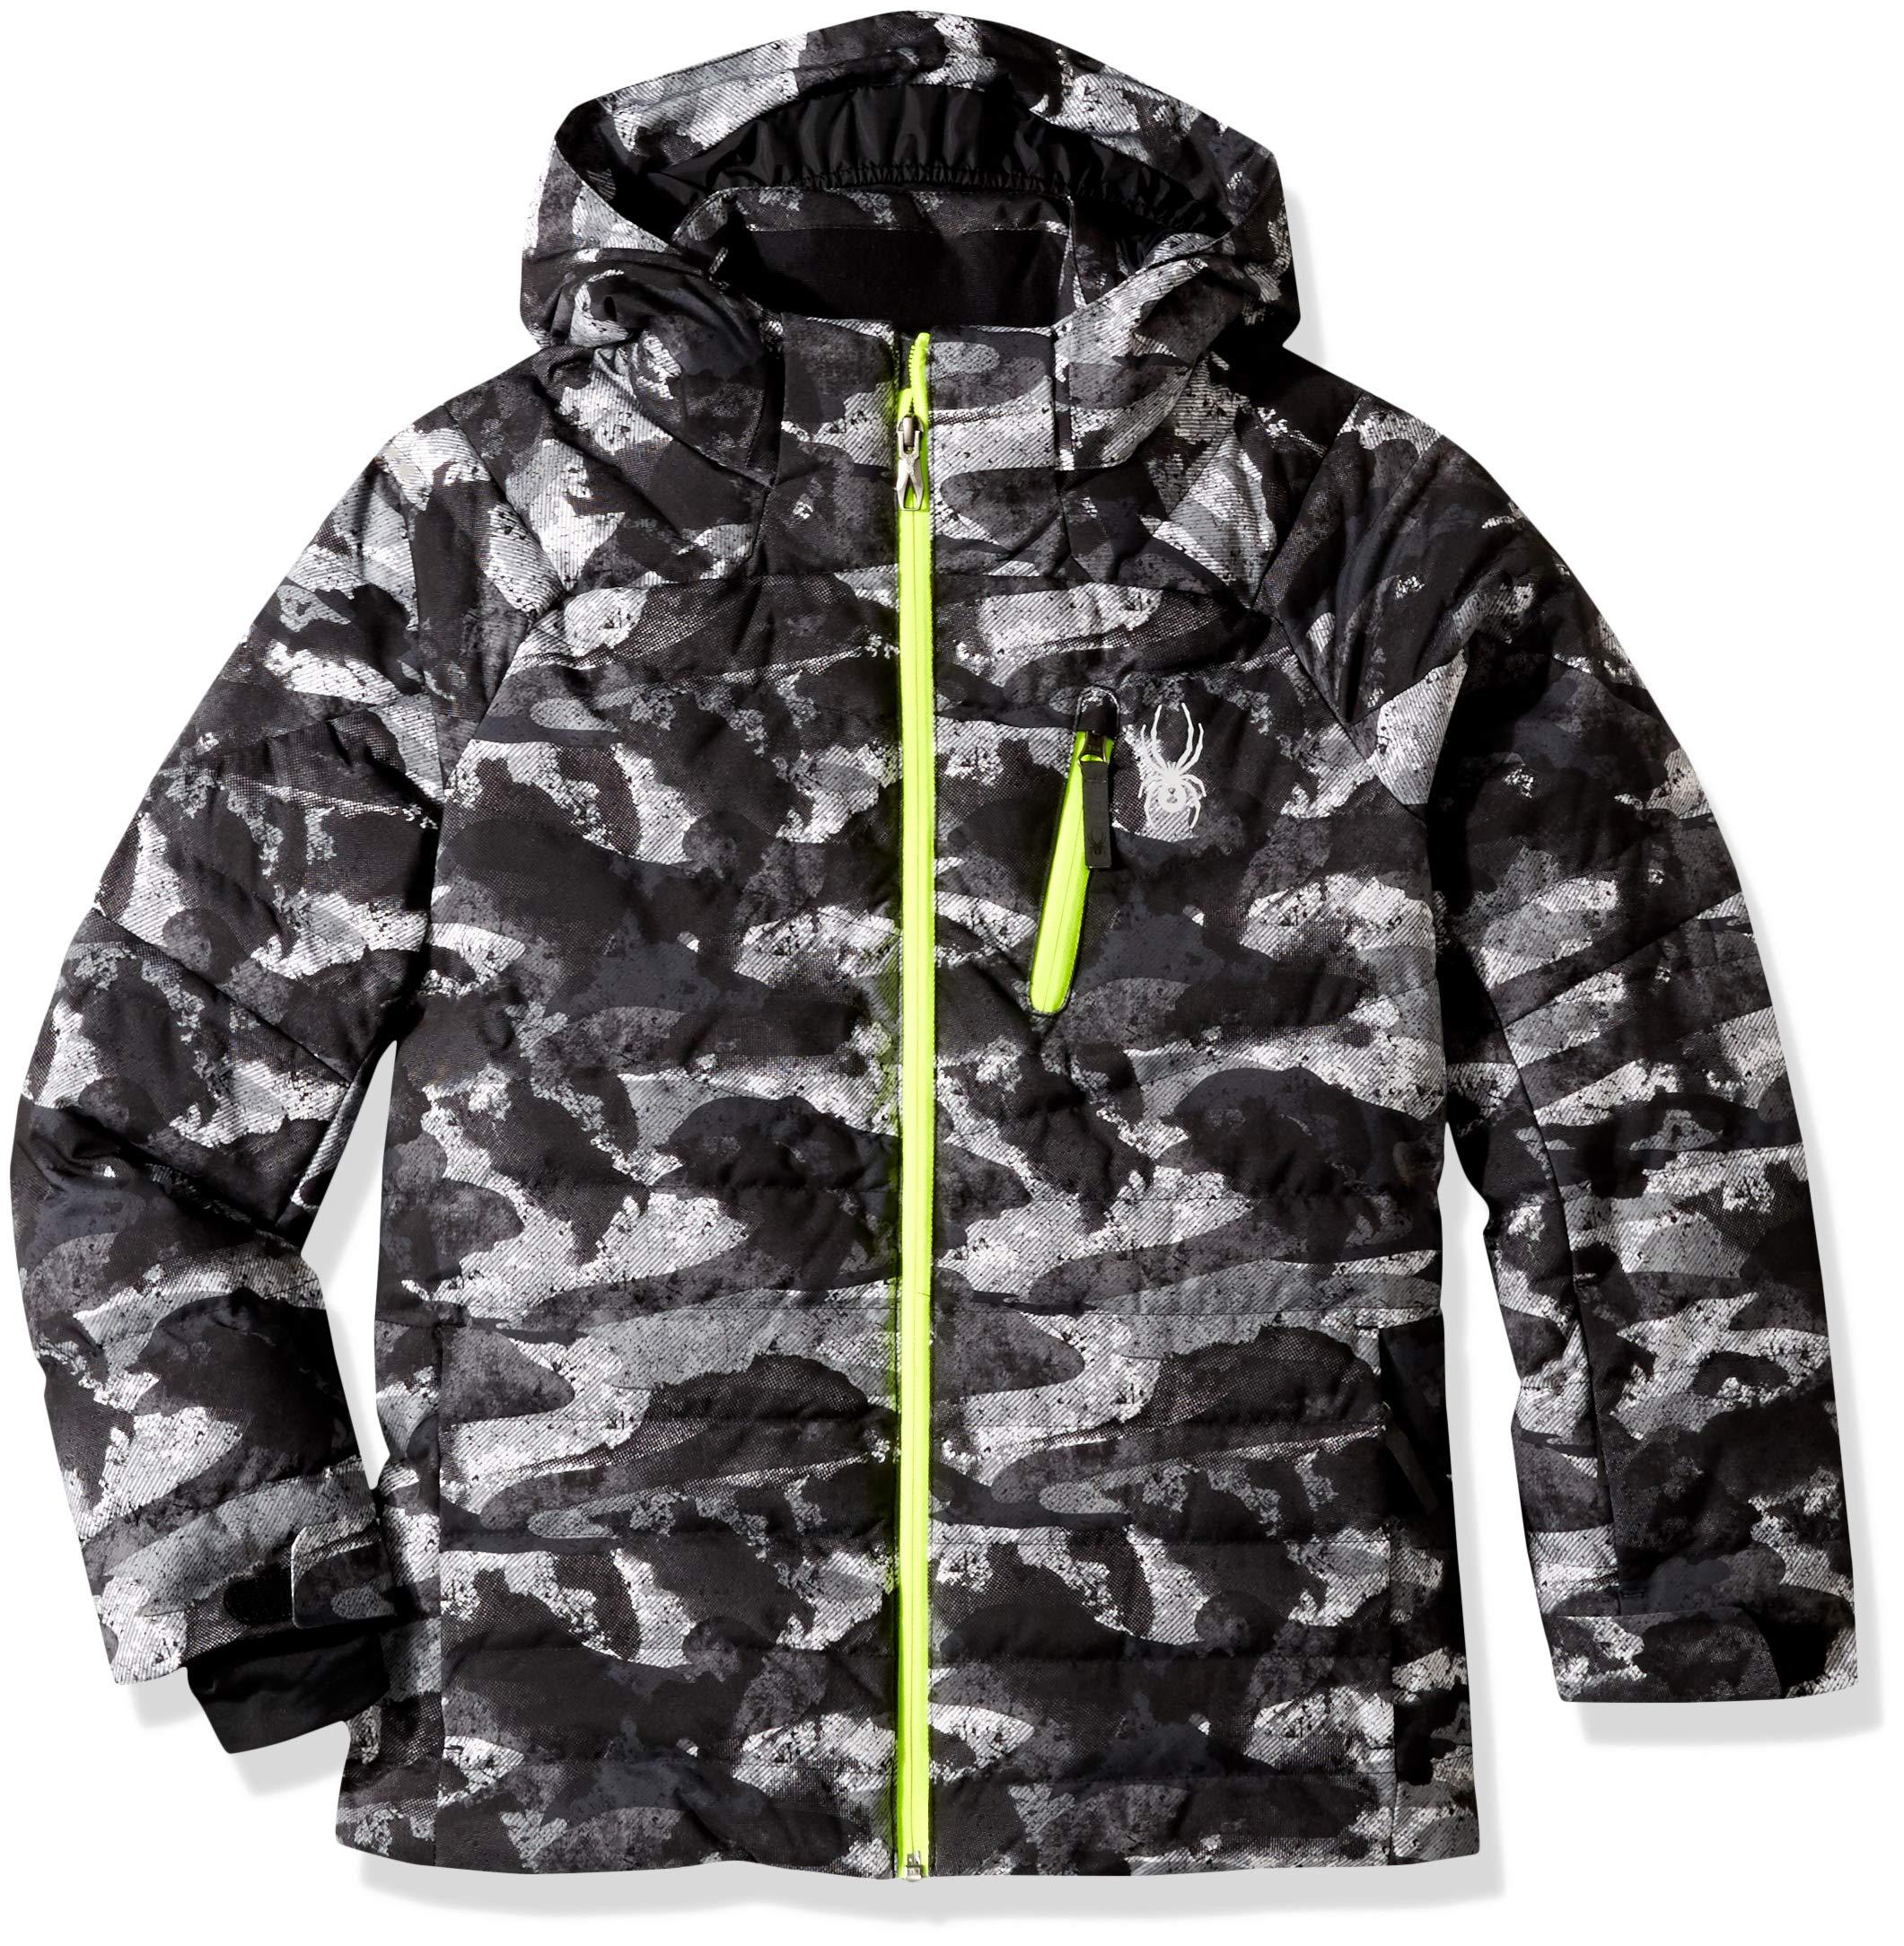 Spyder Boys' Impulse Synthetic Down Ski Jacket, Camo Distress Print/Bryte Yellow, Size 8